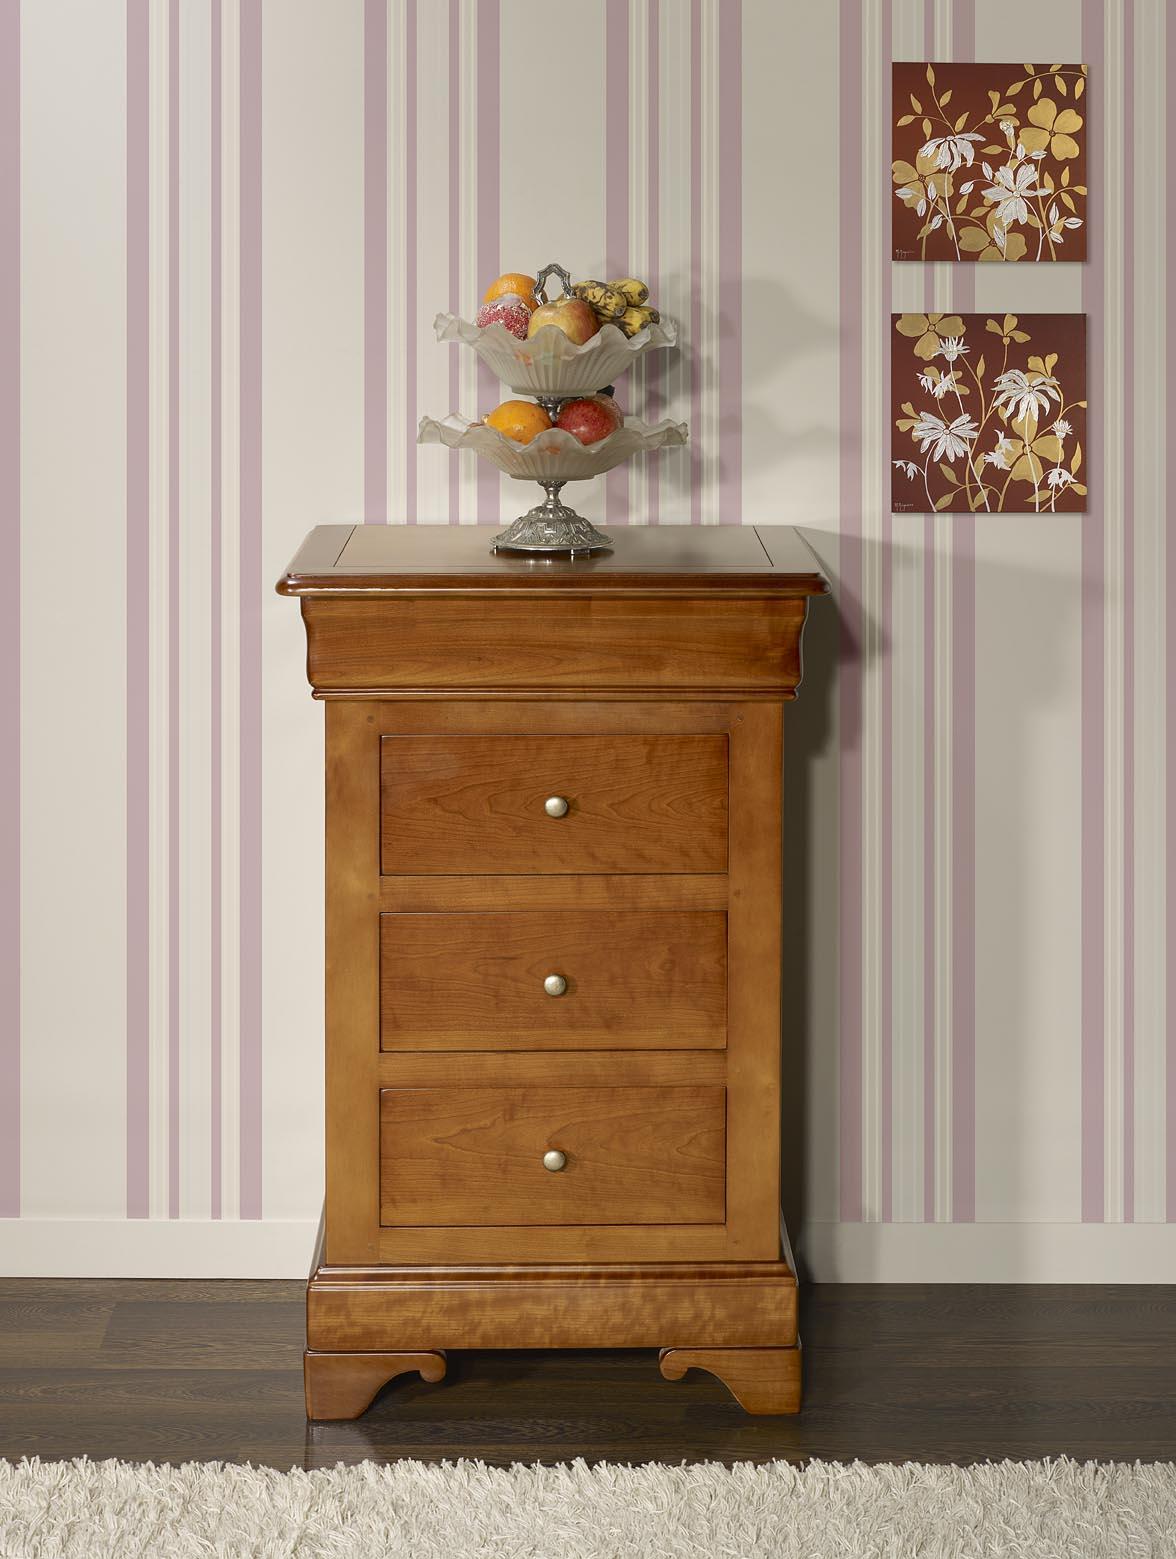 Chiffonnier Bois Massif > Chiffonnier 4 tiroirs en Merisier Massif de style Louis Philippe , meuble en Merisier massif